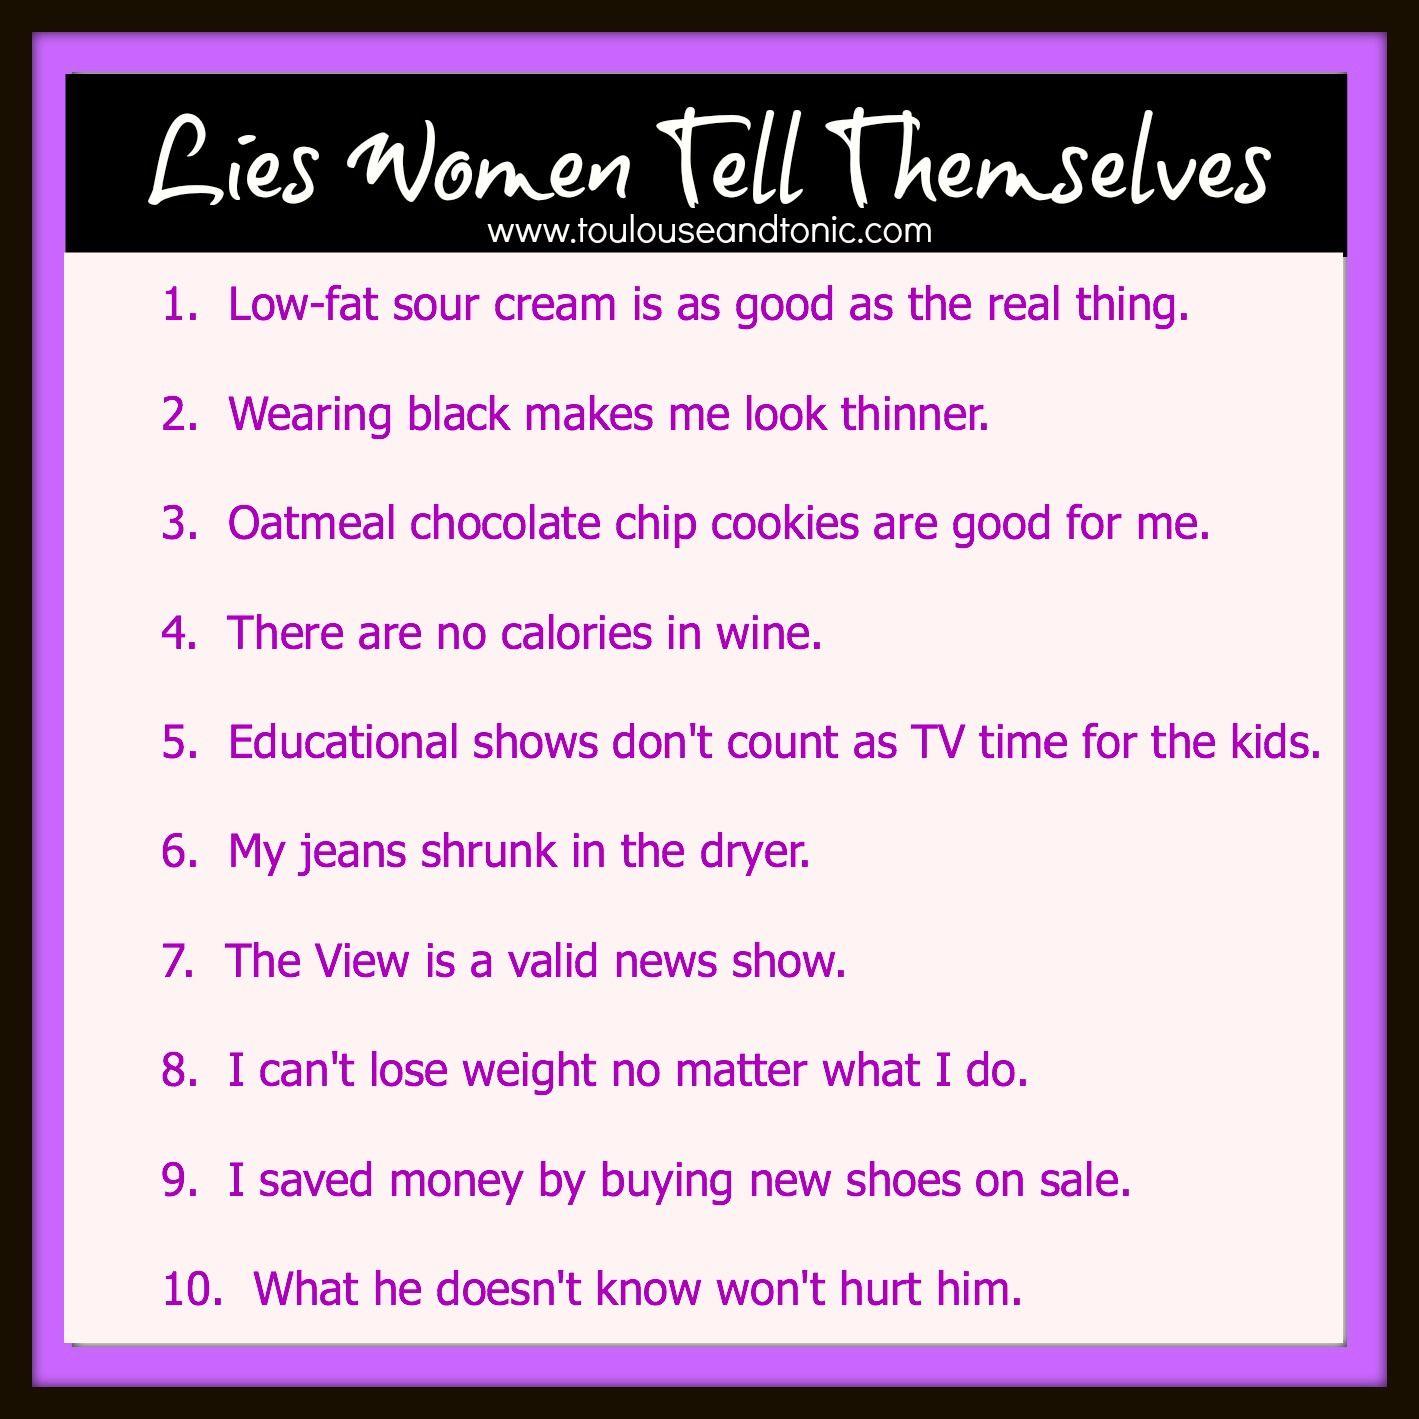 Funny jokes to tell women